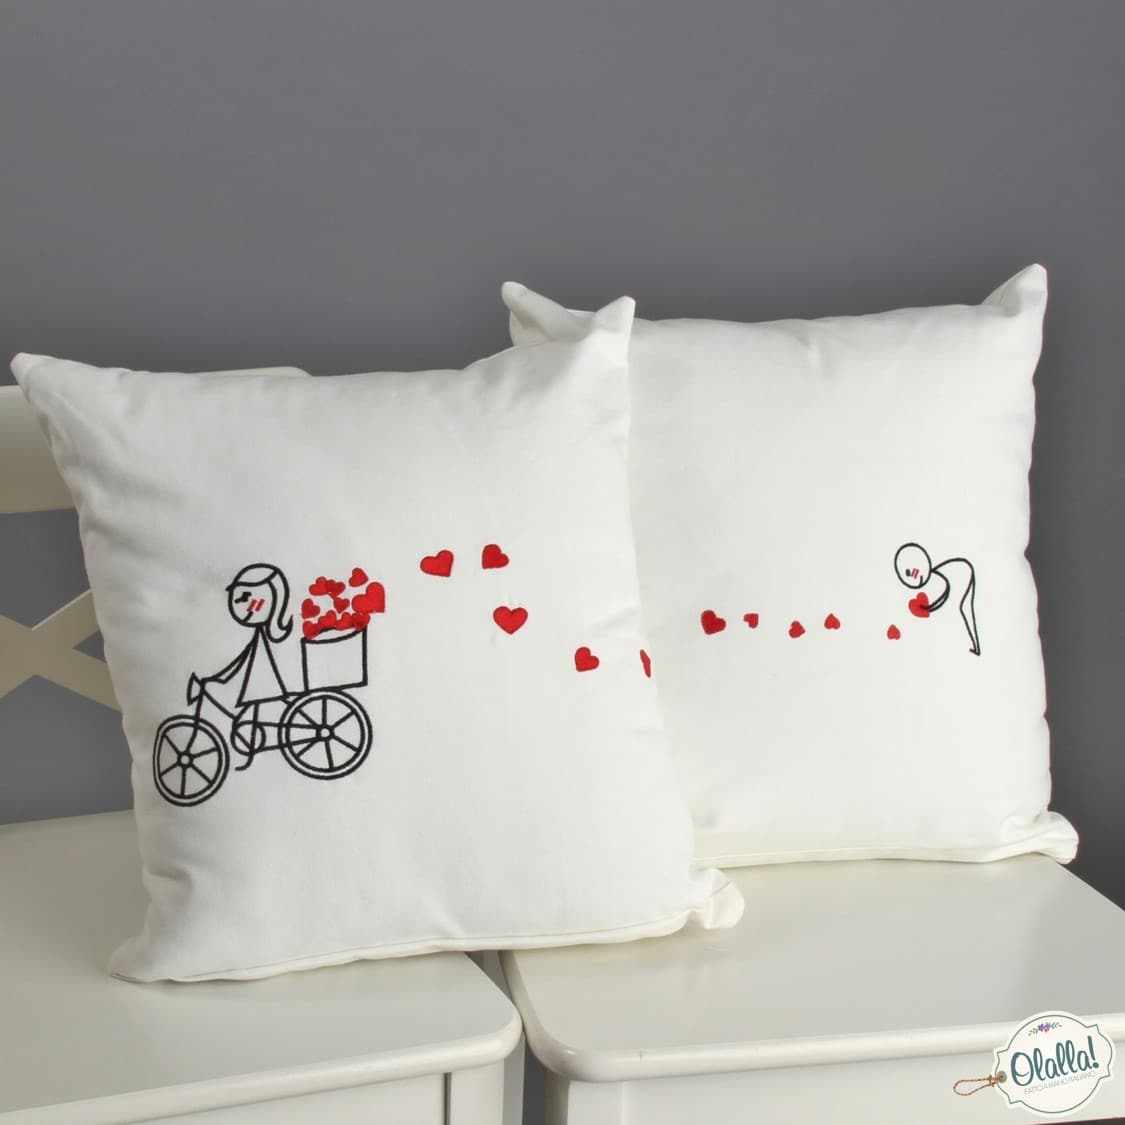 coppia-cuscini-cuori.bicicletta-lui-lei (8)